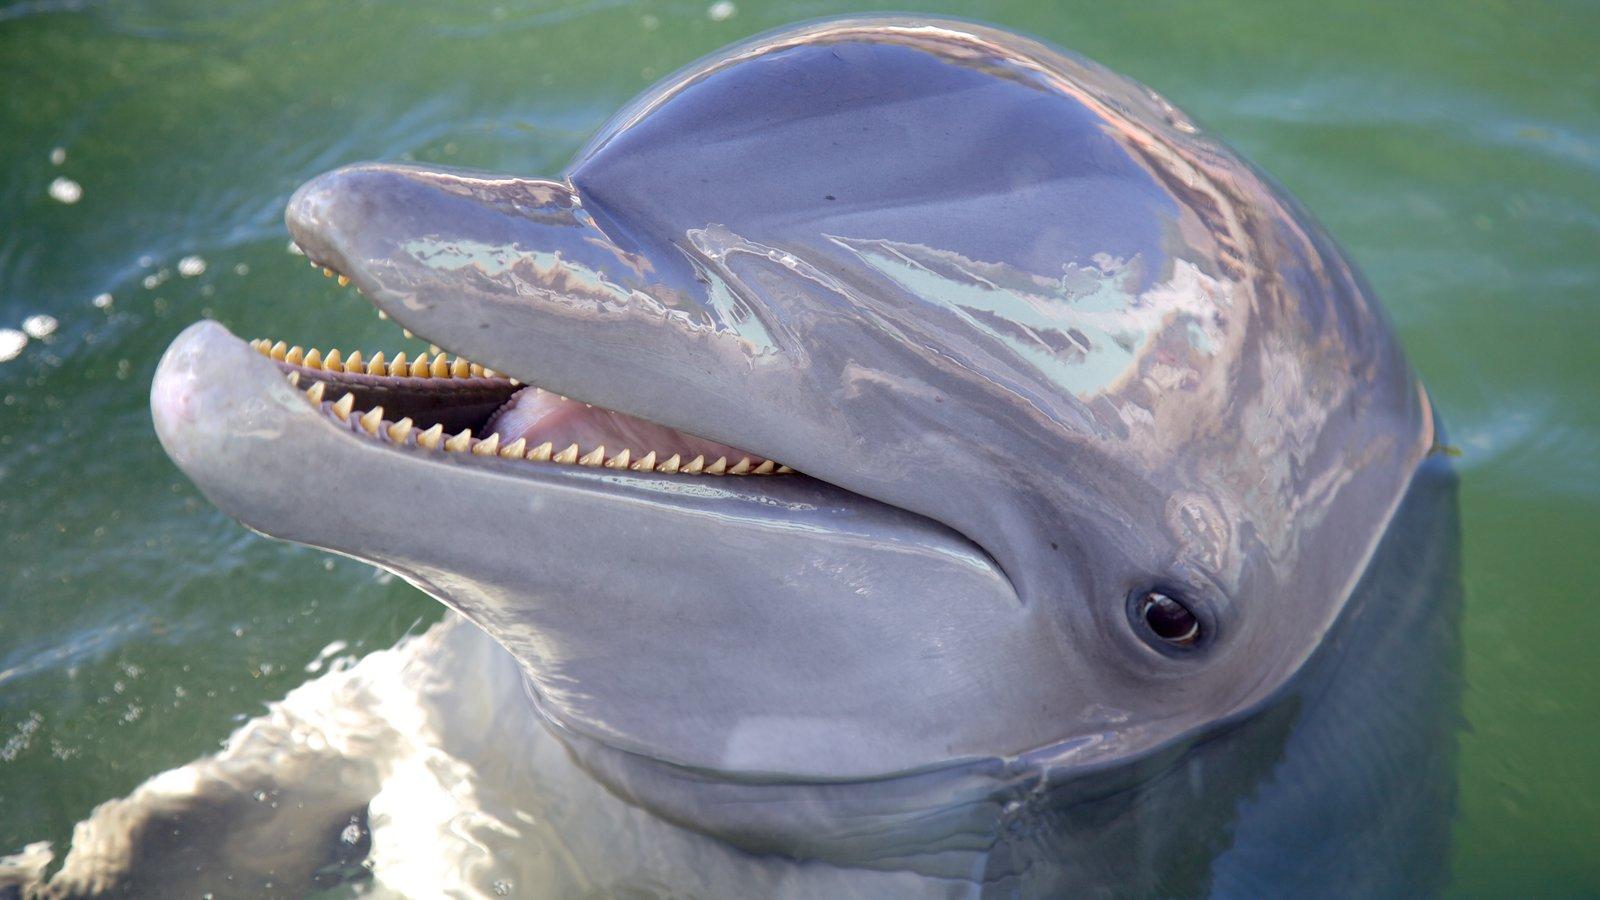 Dolphins Plus caracterizando vida marinha